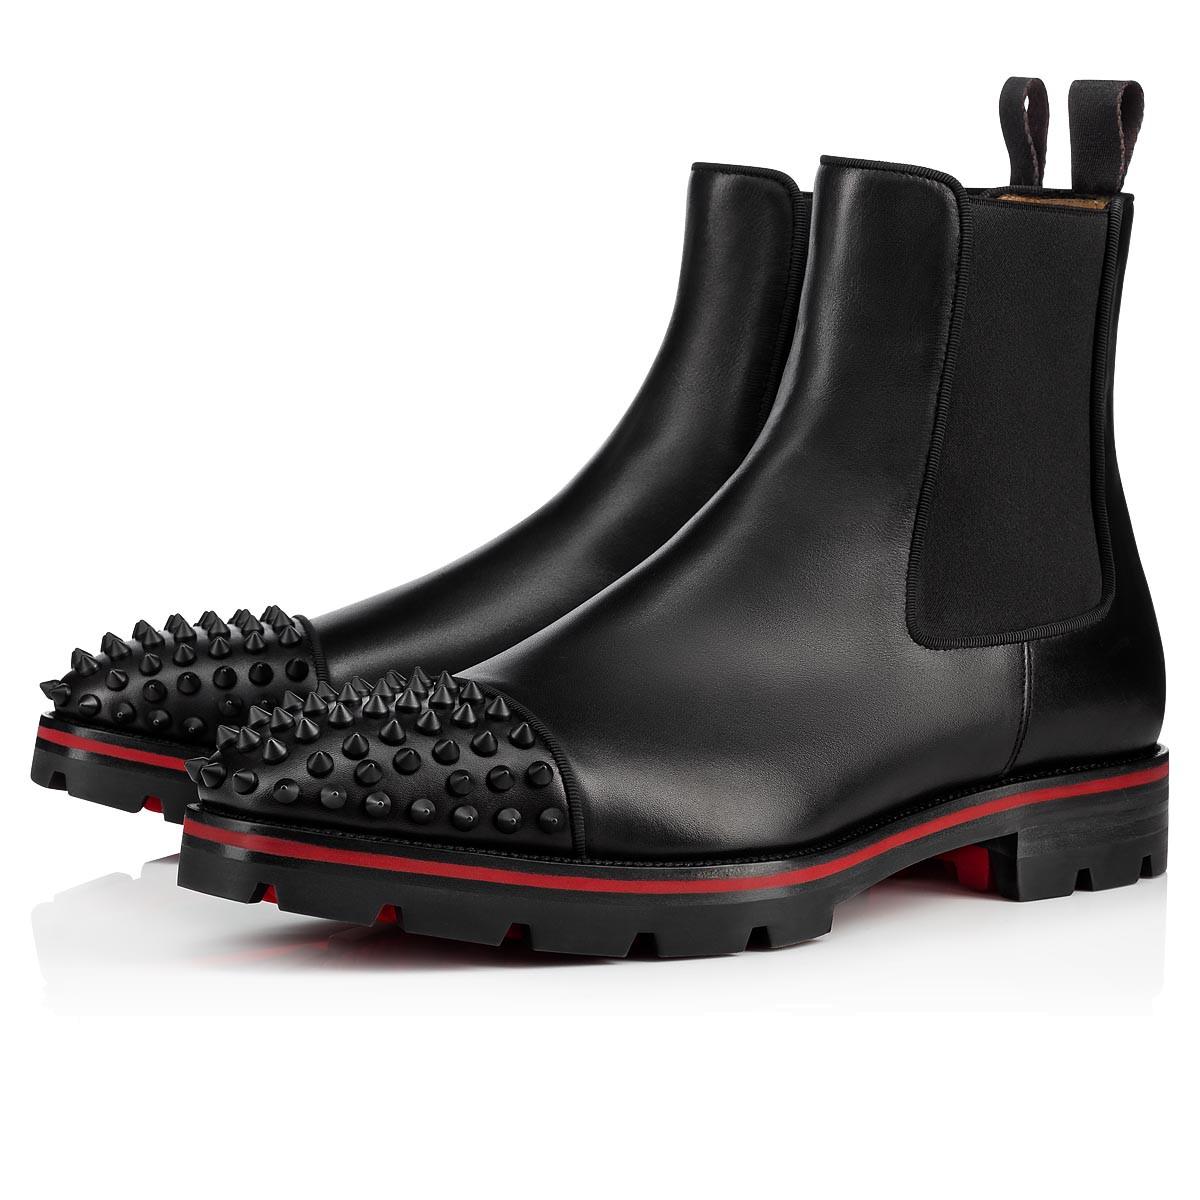 Shoes - Melon Spikes - Christian Louboutin